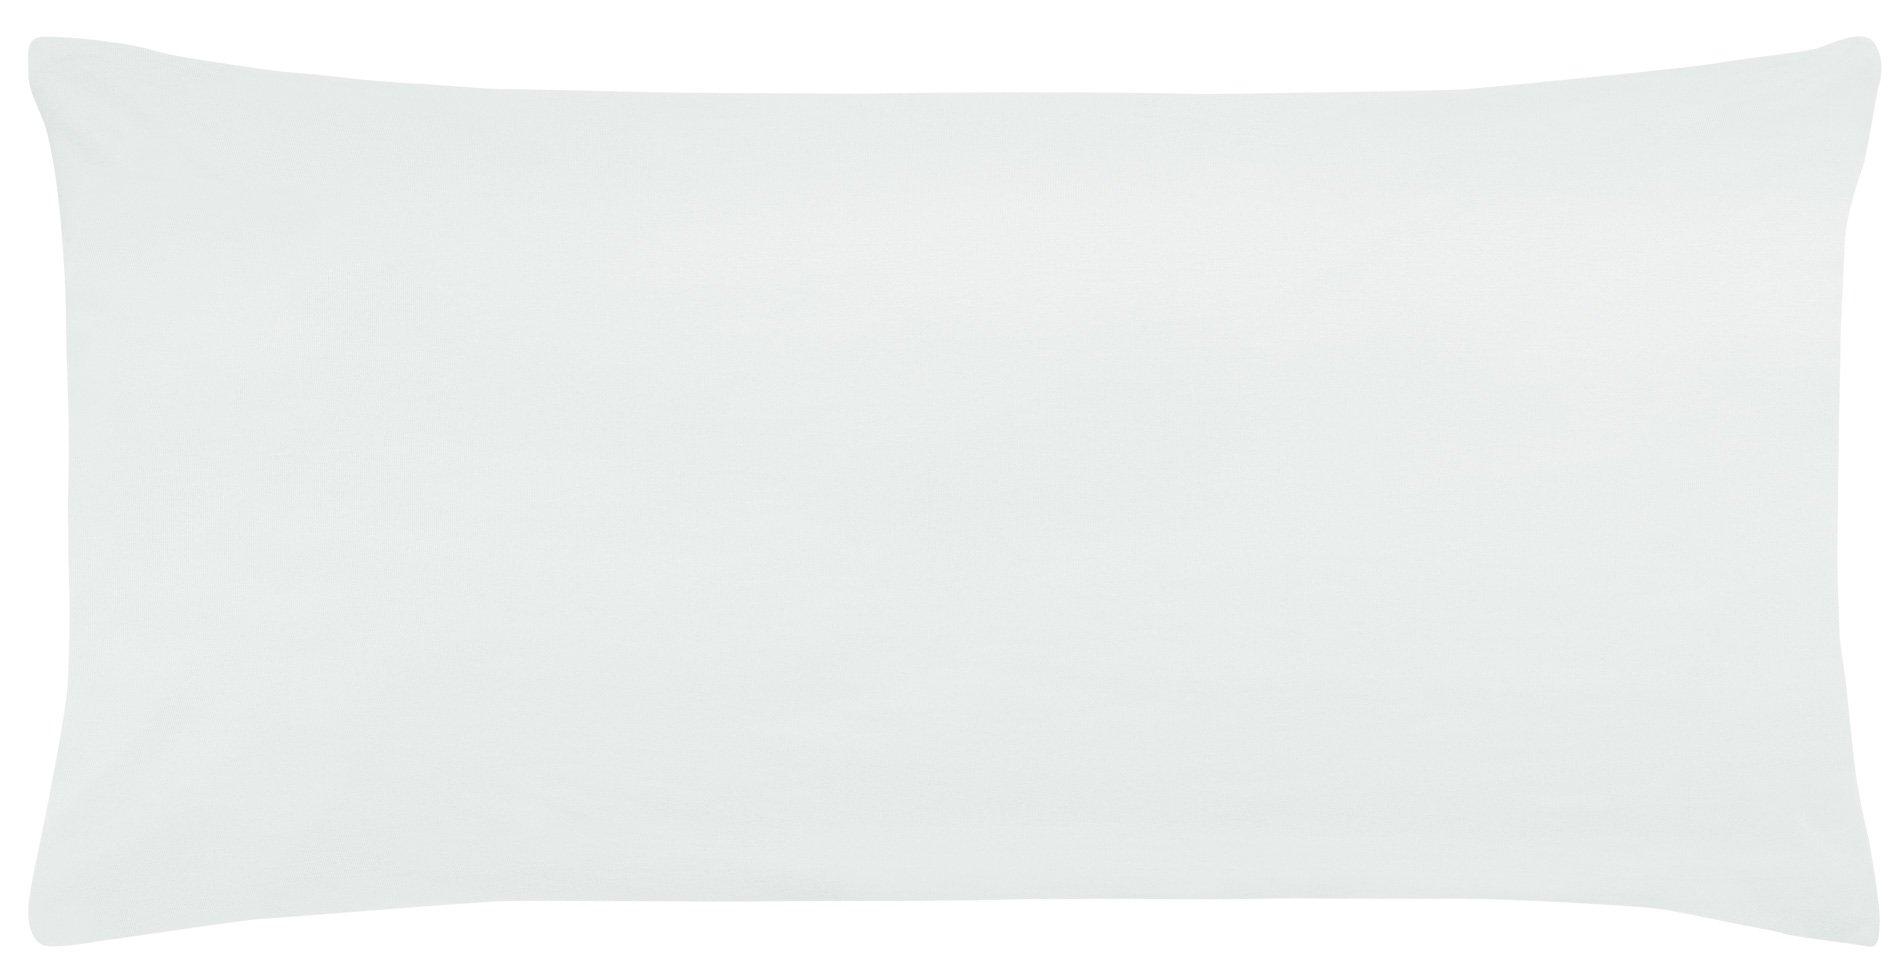 Edel-Zwirn-Jersey weiss B40cm